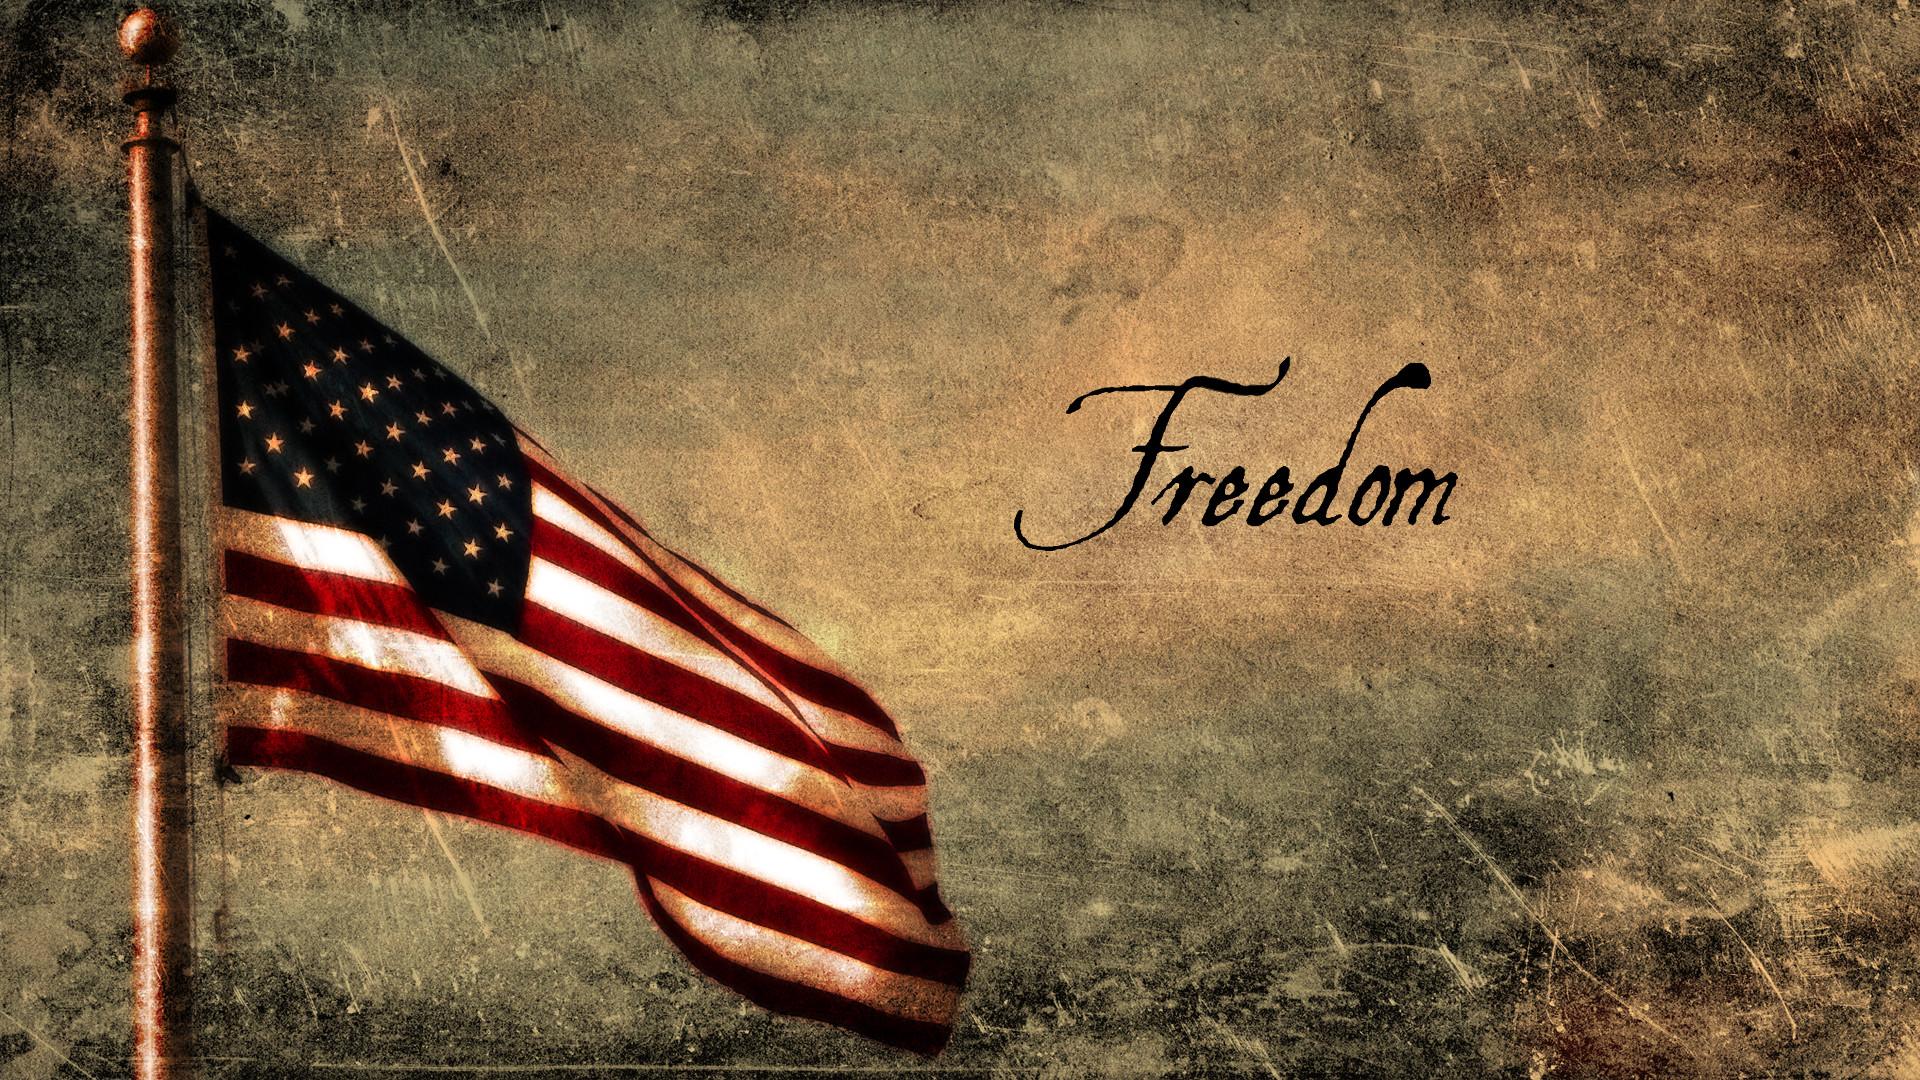 City Wallpaper: Vintage American Flag 1080p Wallpaper For HD .